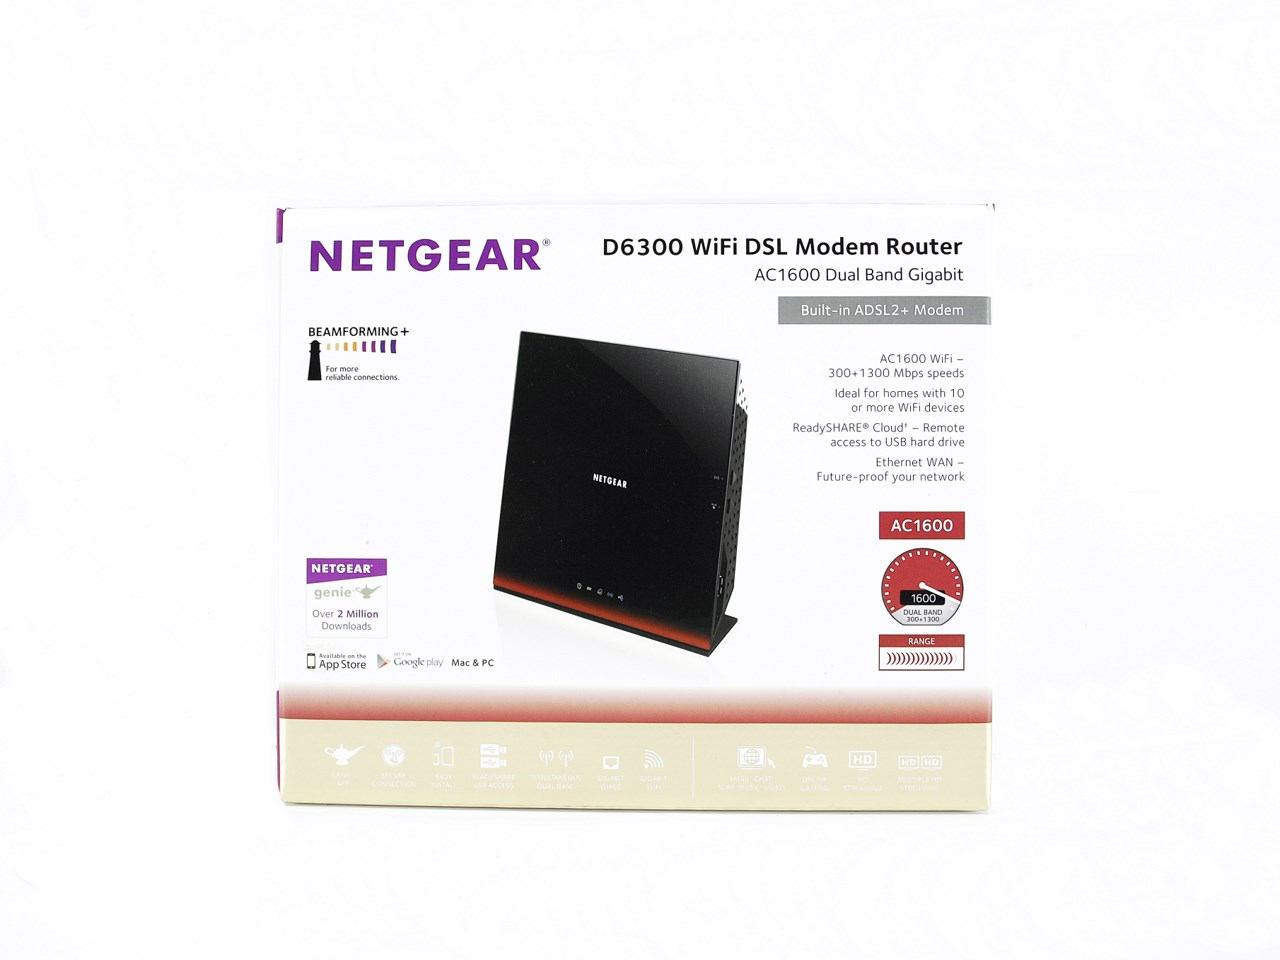 Netgear D6300 Ac1600 Dual Band Gigabit Modem Router Review How To Hook Up Wireless Dsl Apps Directories 01t